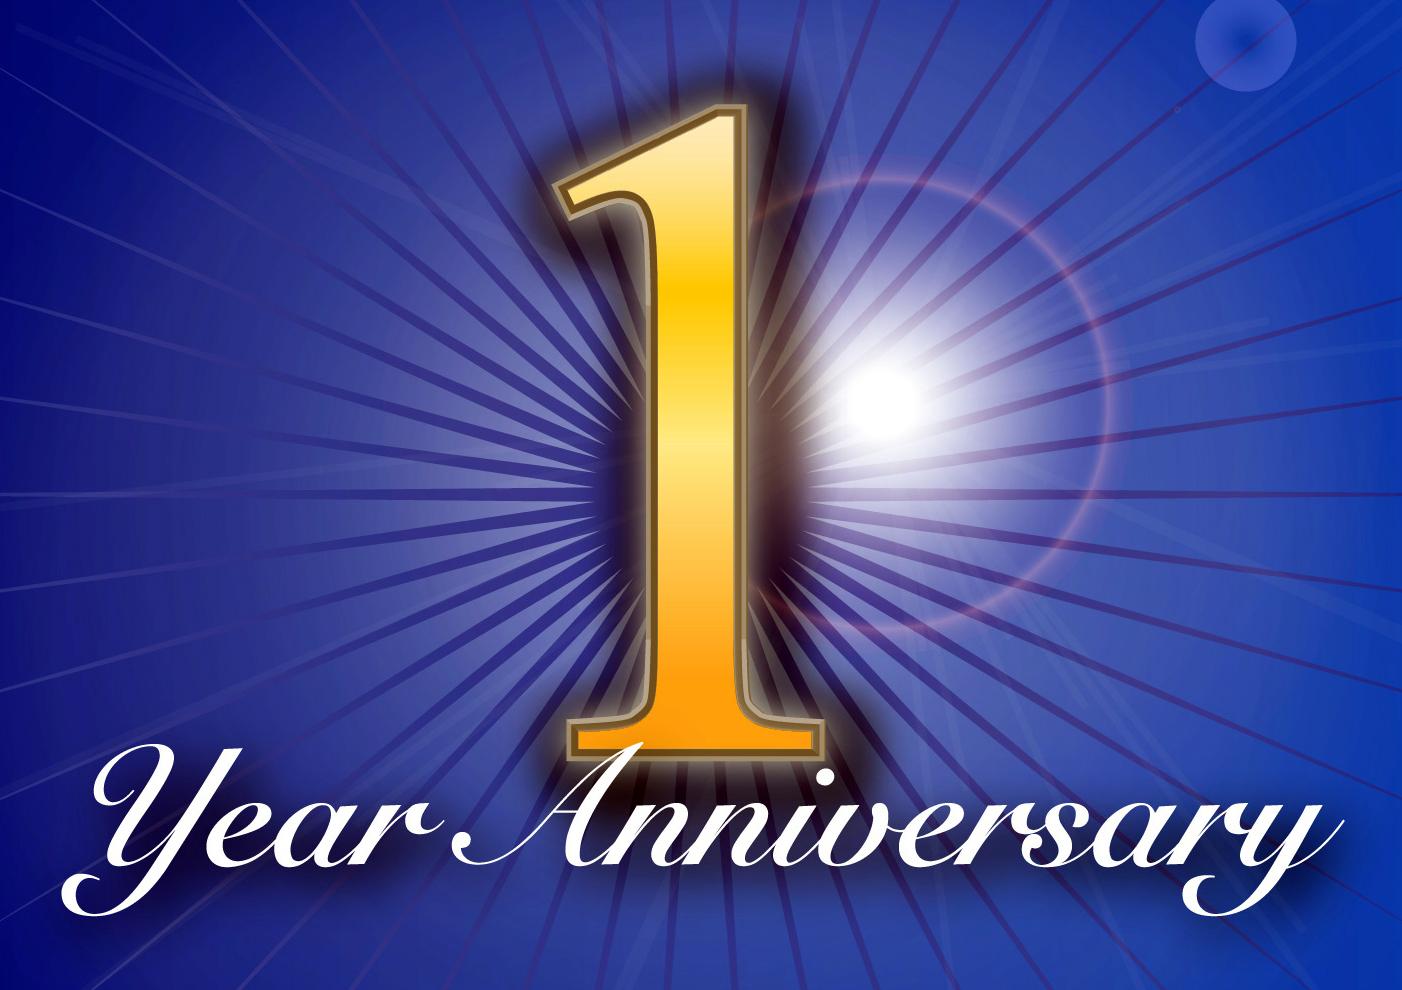 The super organizer universe year anniversary